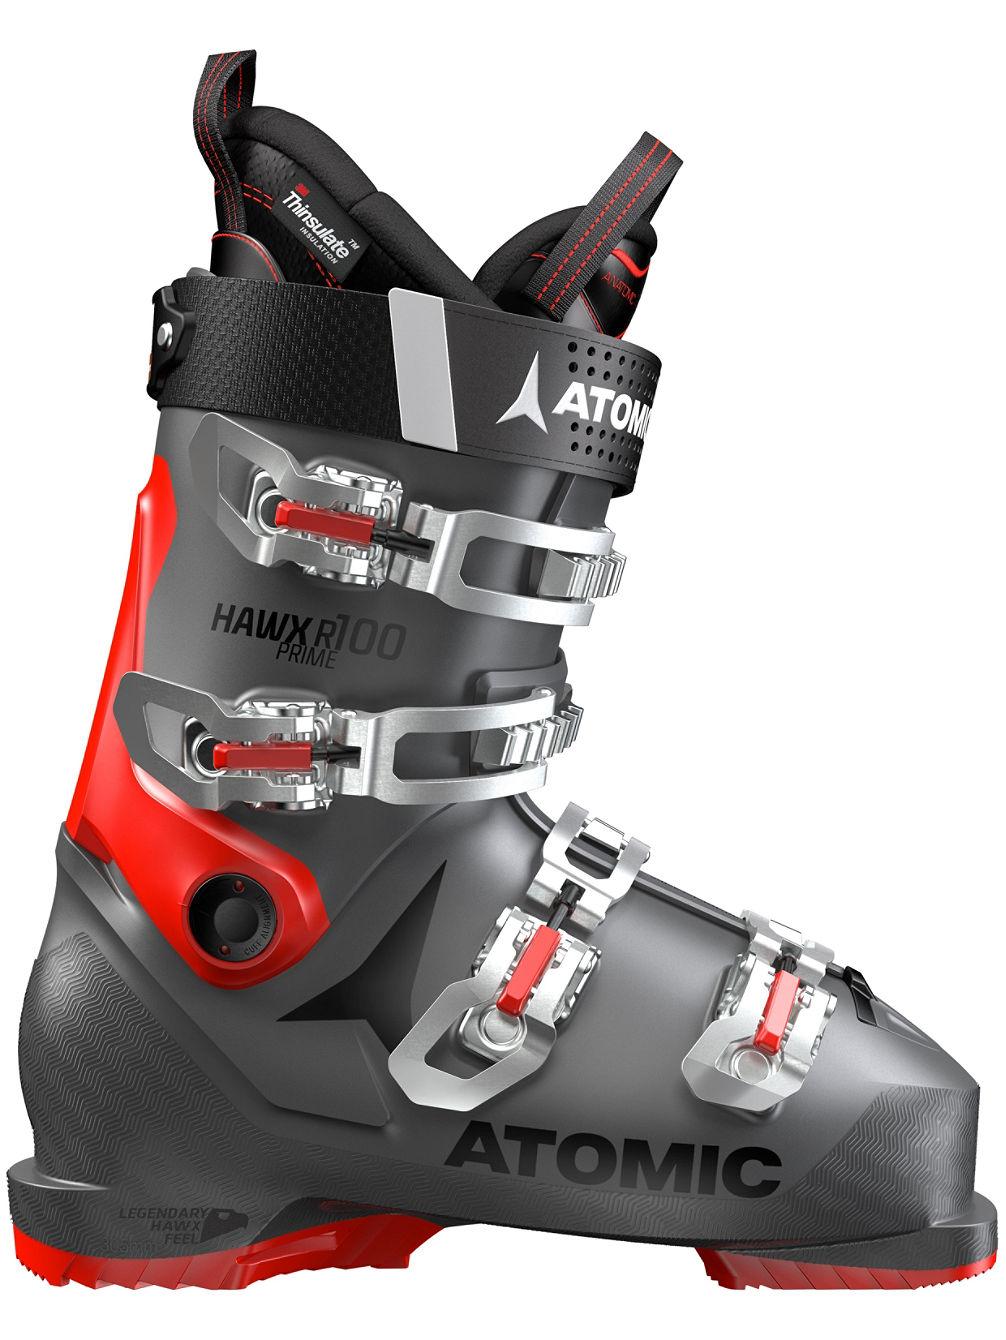 c5427f3a816 Atomic Hawx Prime R100 2019 Skischoenen online kopen bij Blue Tomato